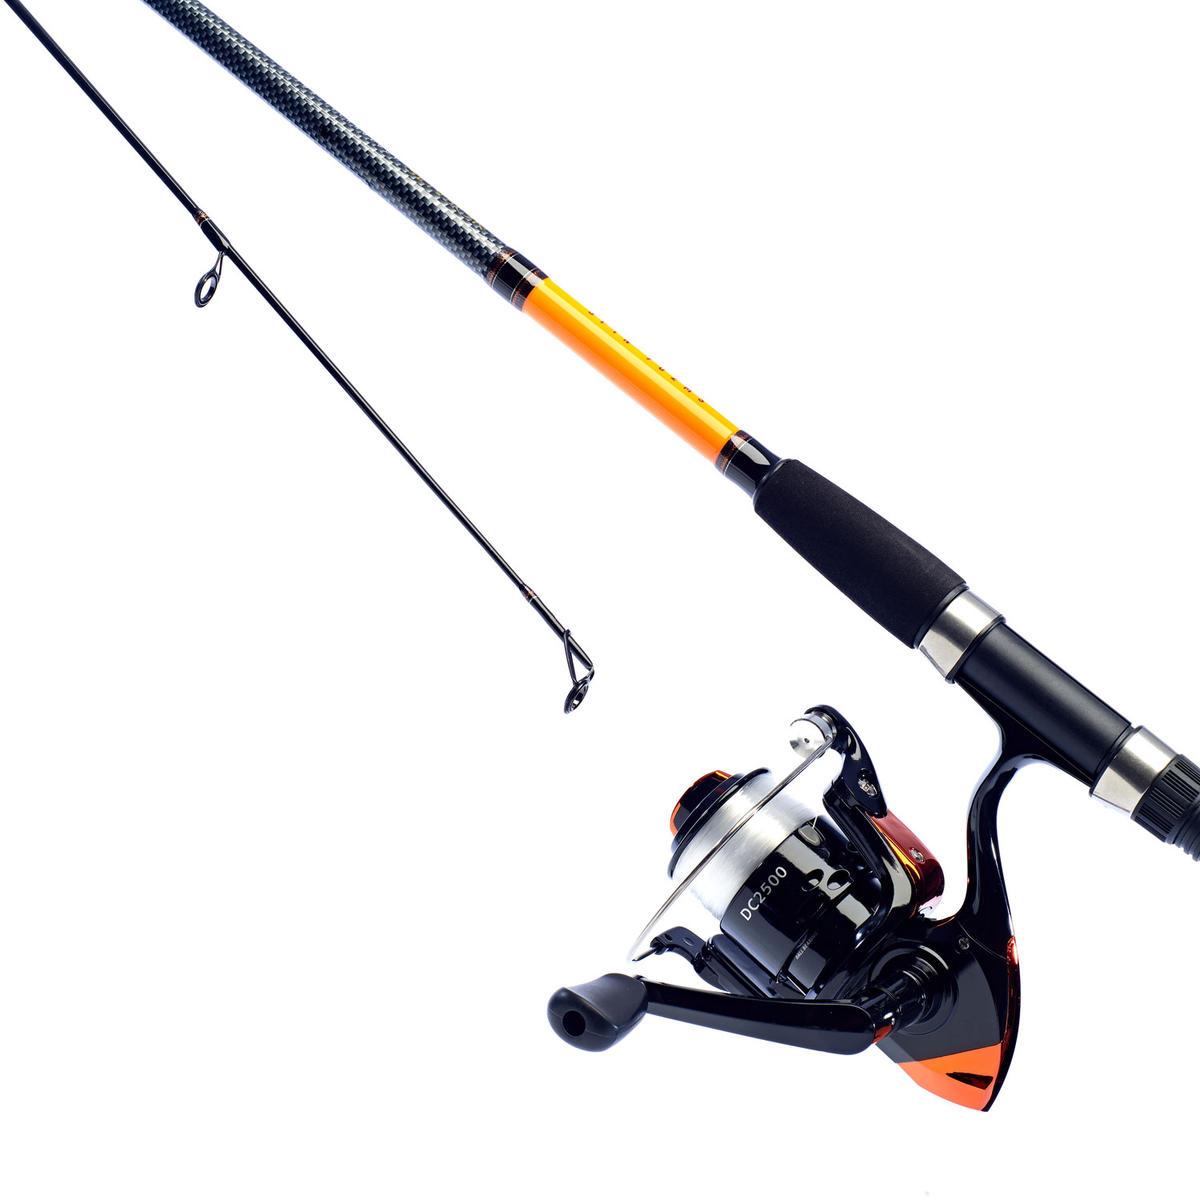 New Daiwa Sensor Fishing Combo - 8ft Rod & Sensor 2500 Reel - Loaded with Mono